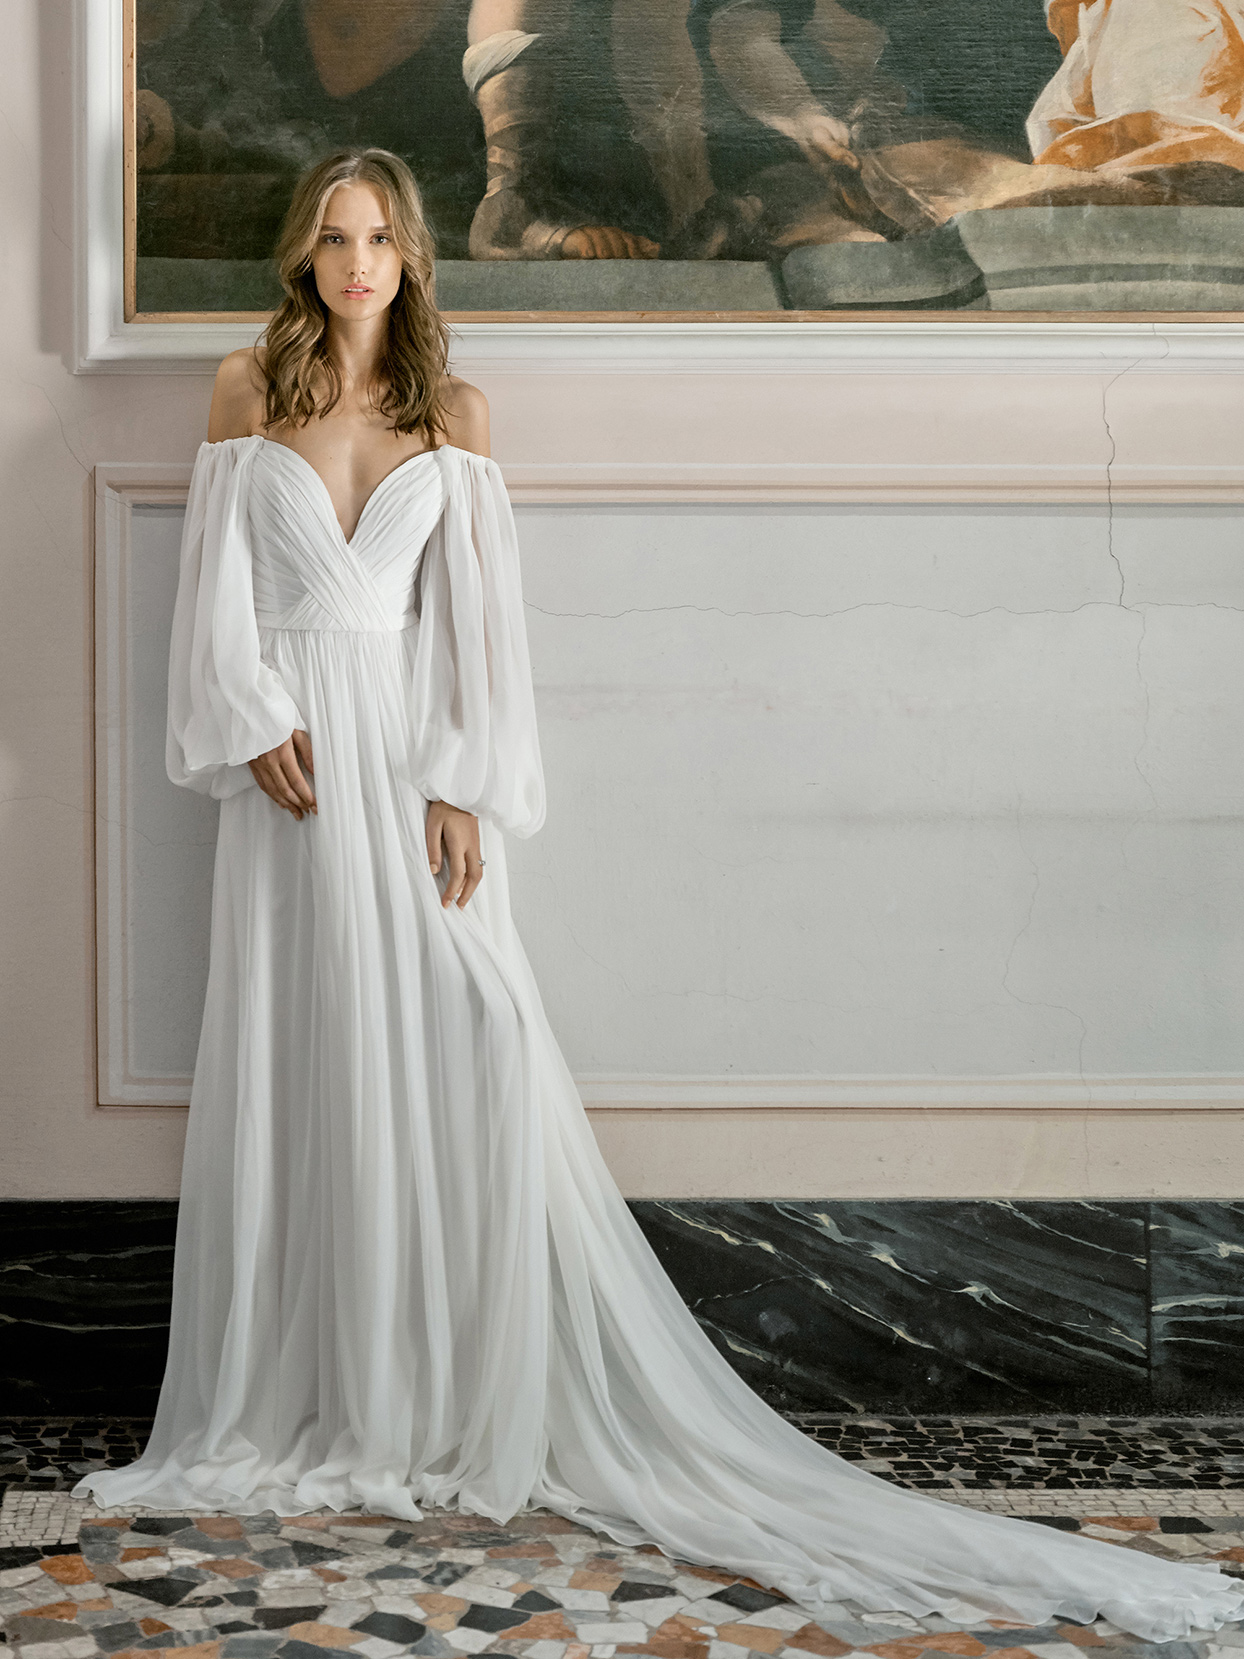 monique lhuillier off the shoulder deep v-neck wedding dress fall 2020